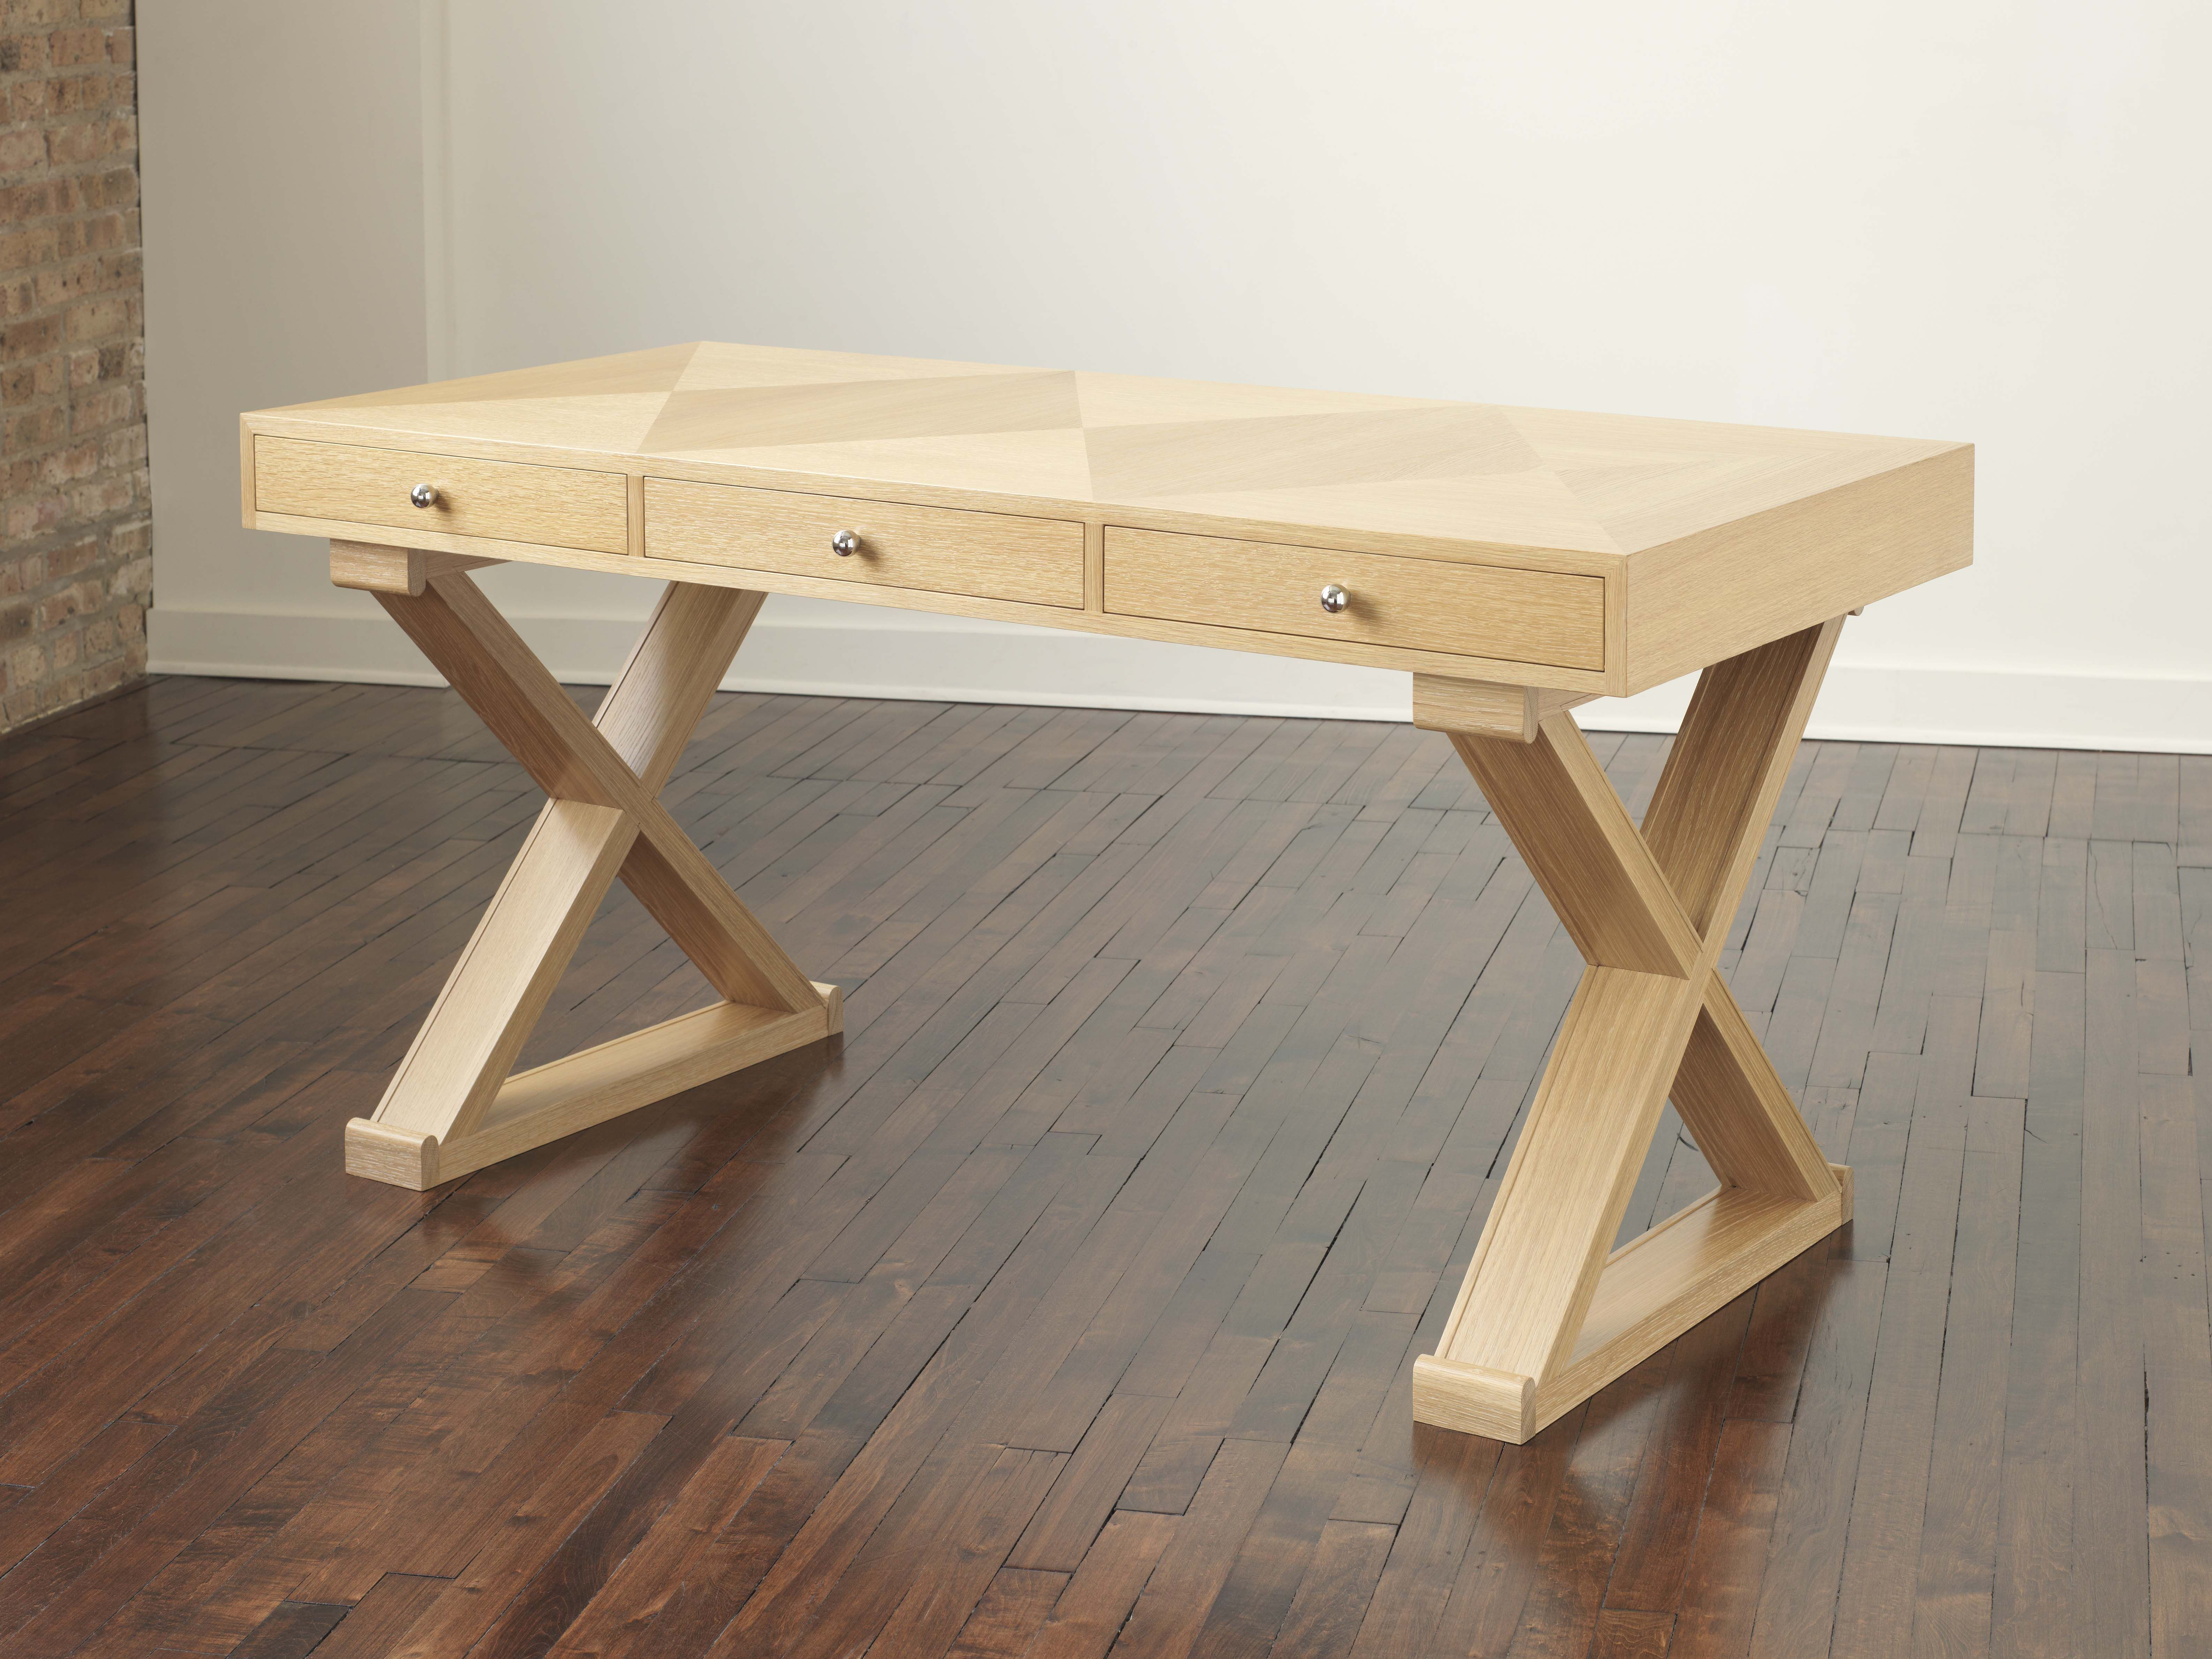 mattaliano frank x base desk mattaliano furniture pinterest rh pinterest com x base desk diy x base computer desk